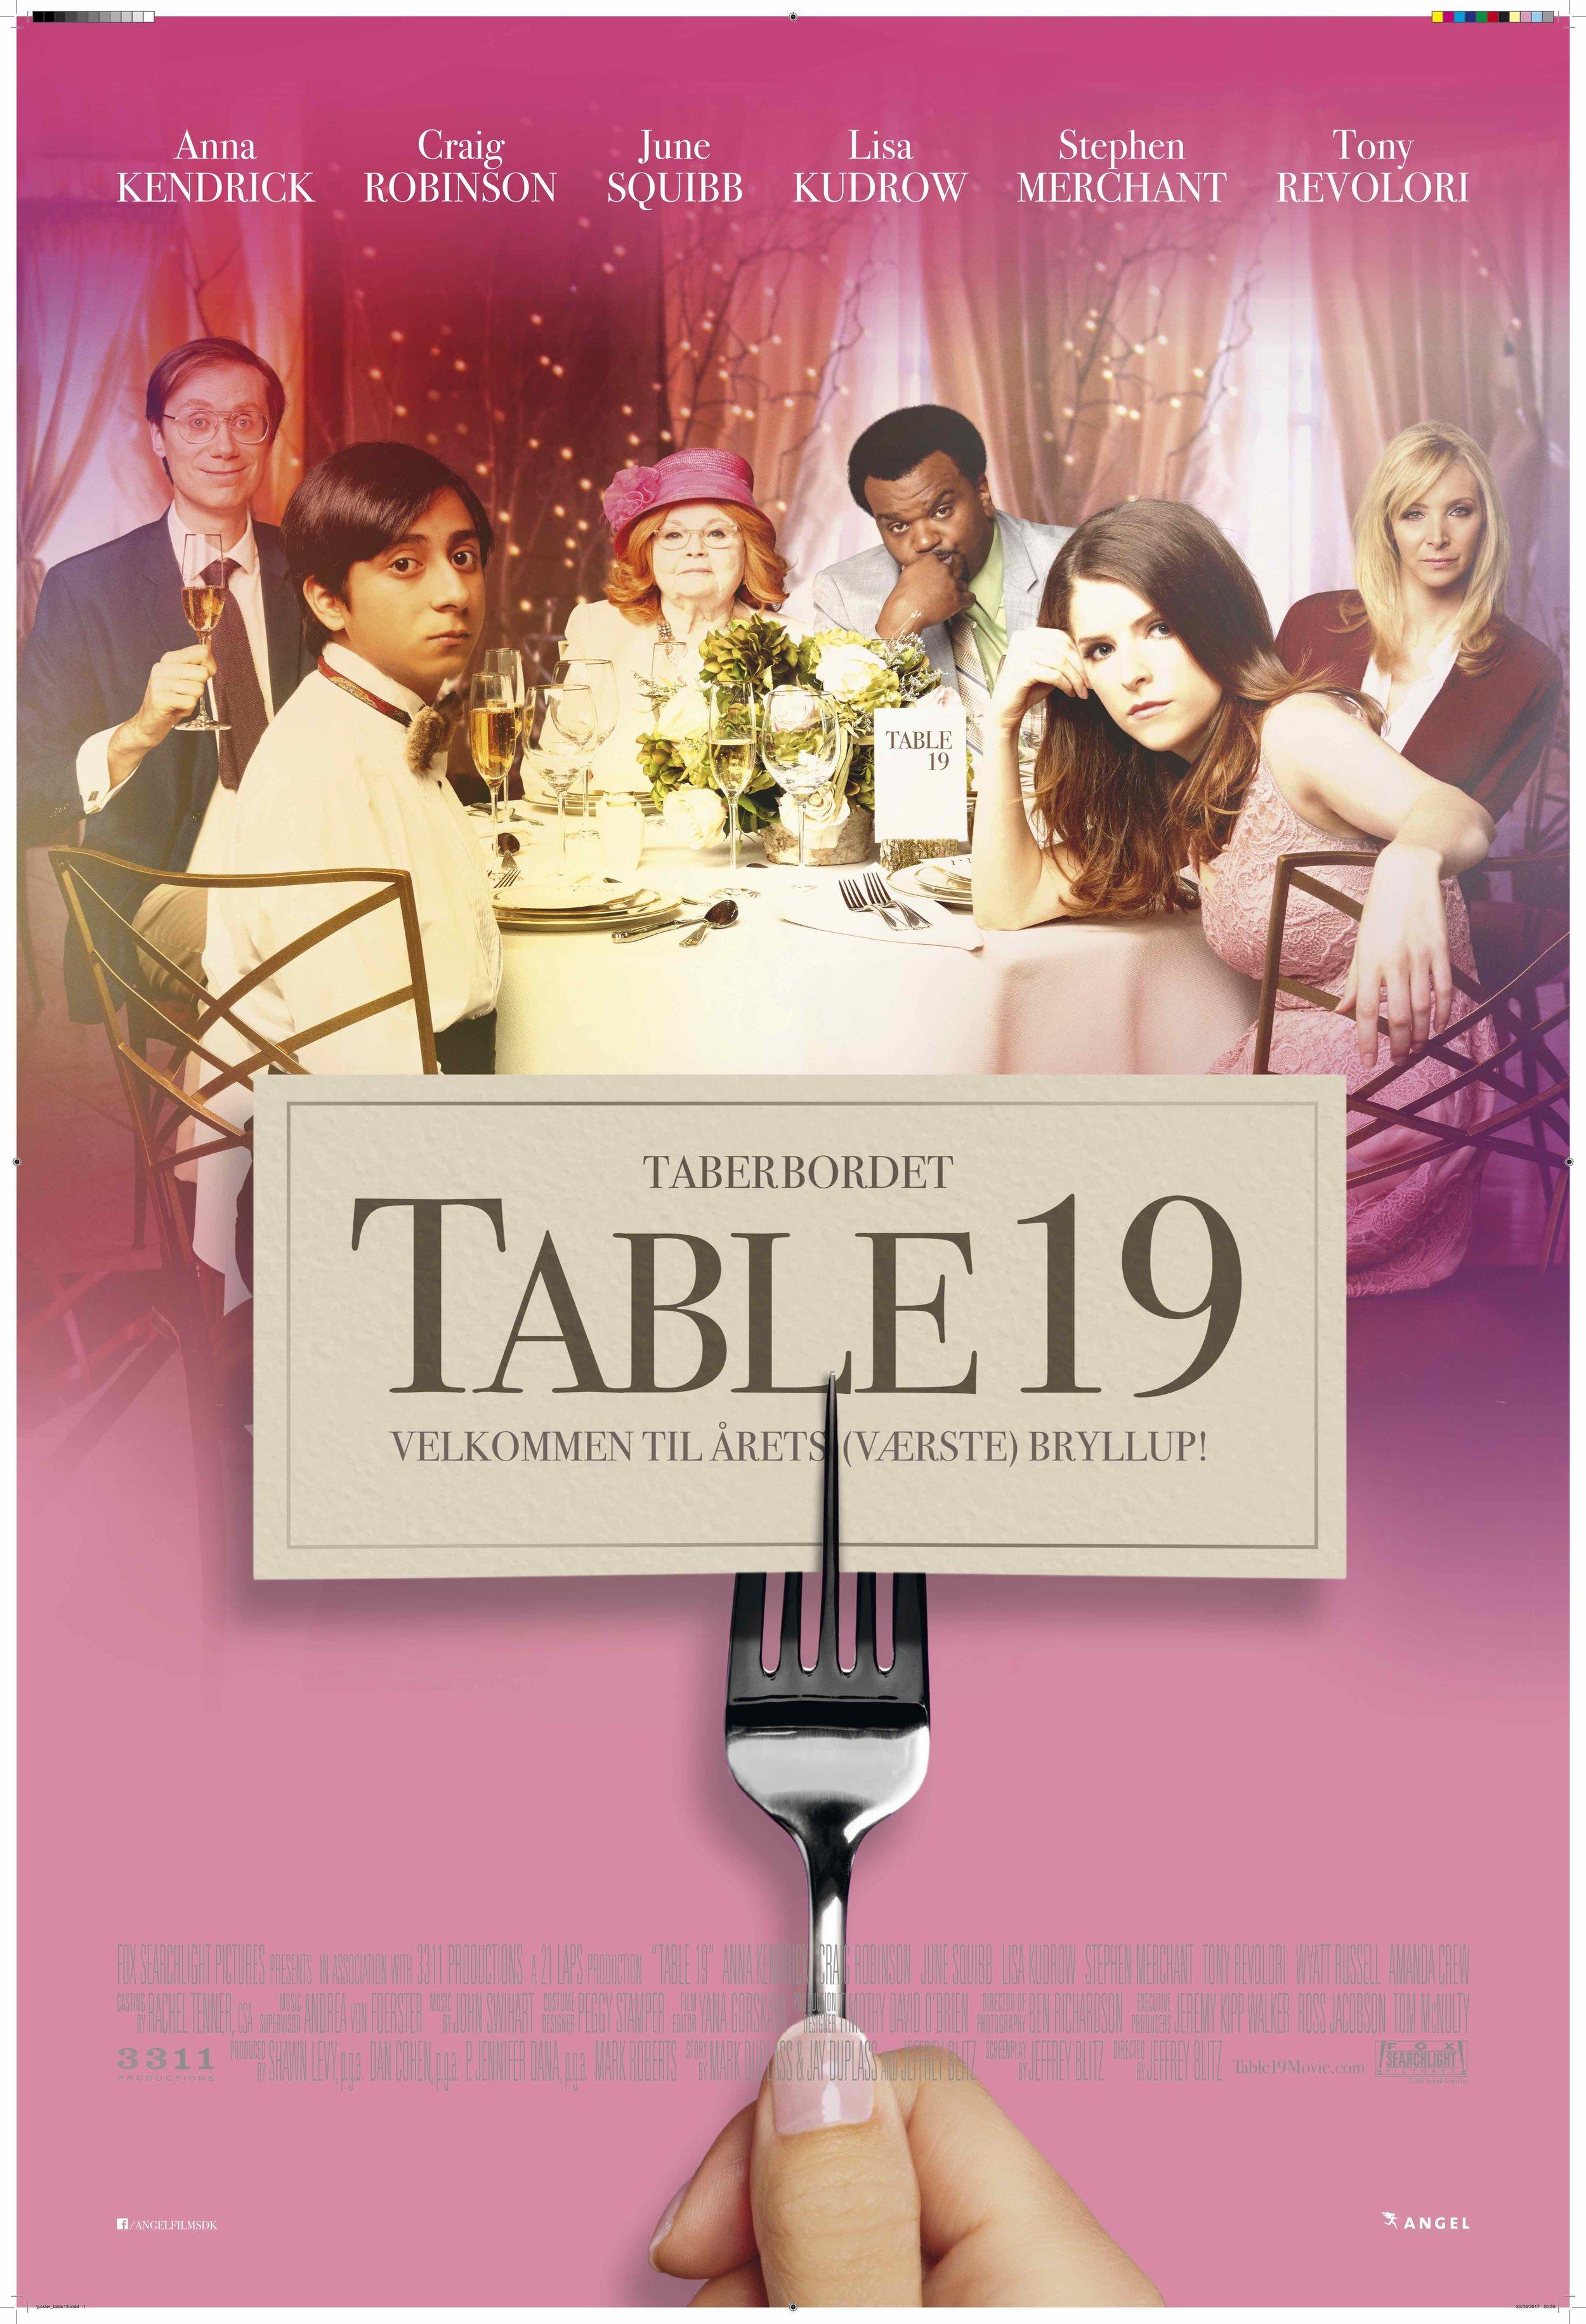 poster_table19.jpg